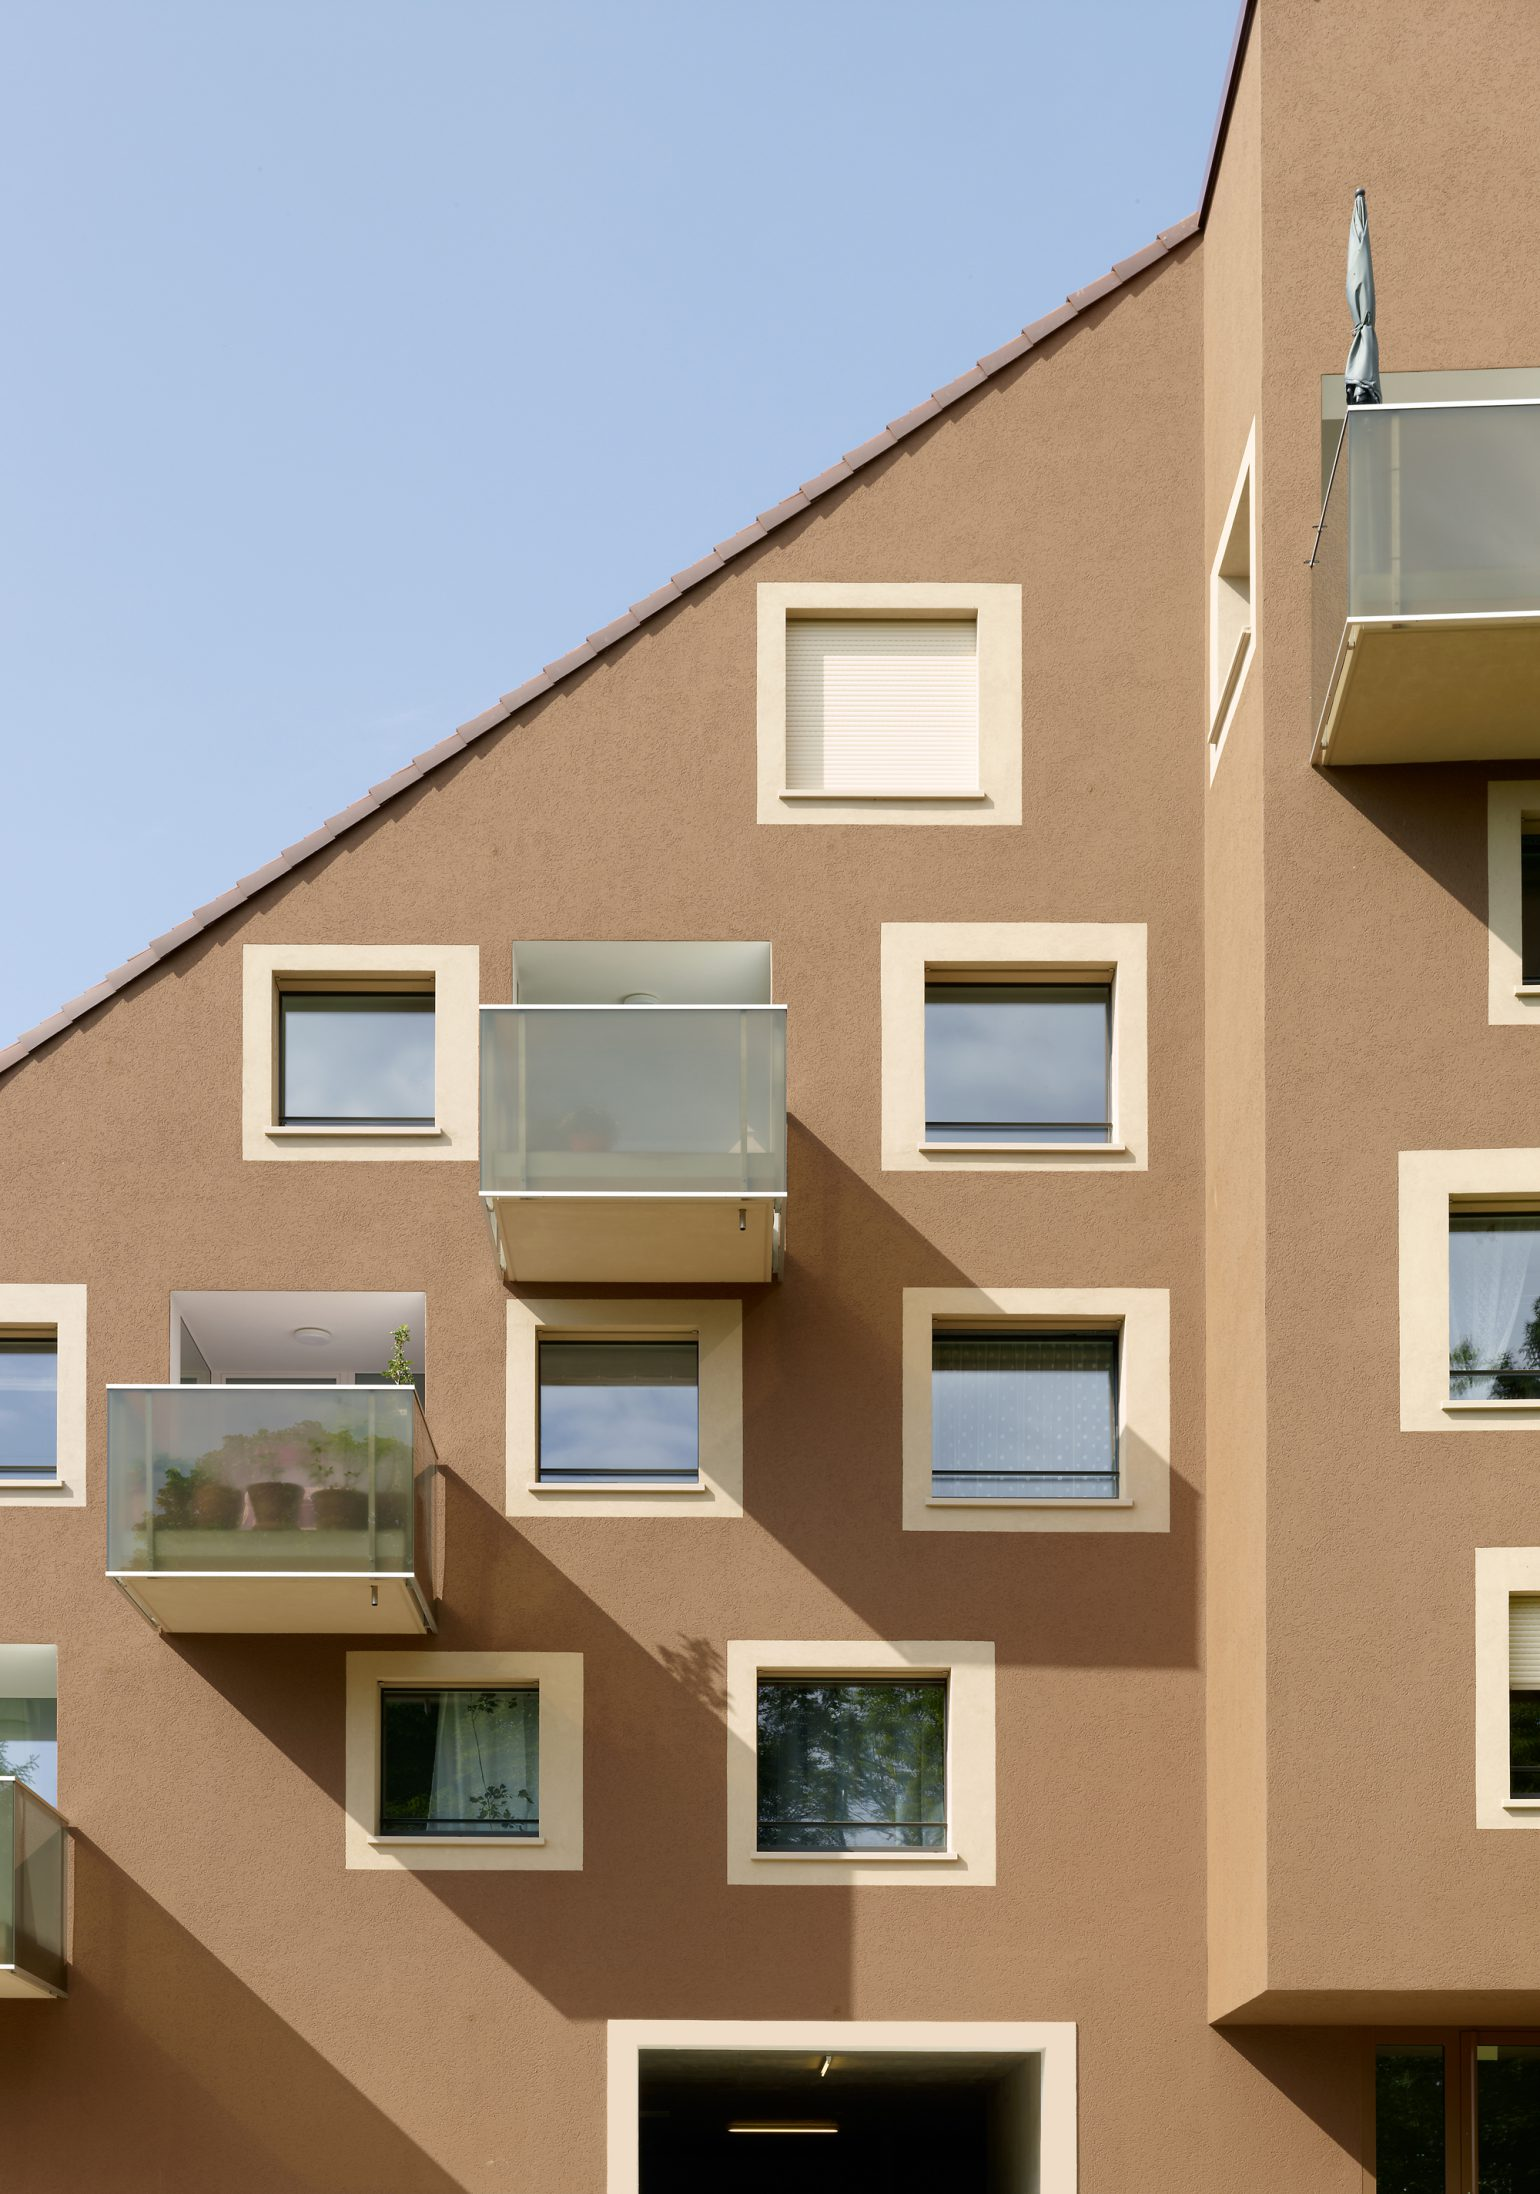 immeuble_habitation_genolier_meyer_achitecture_sion_03